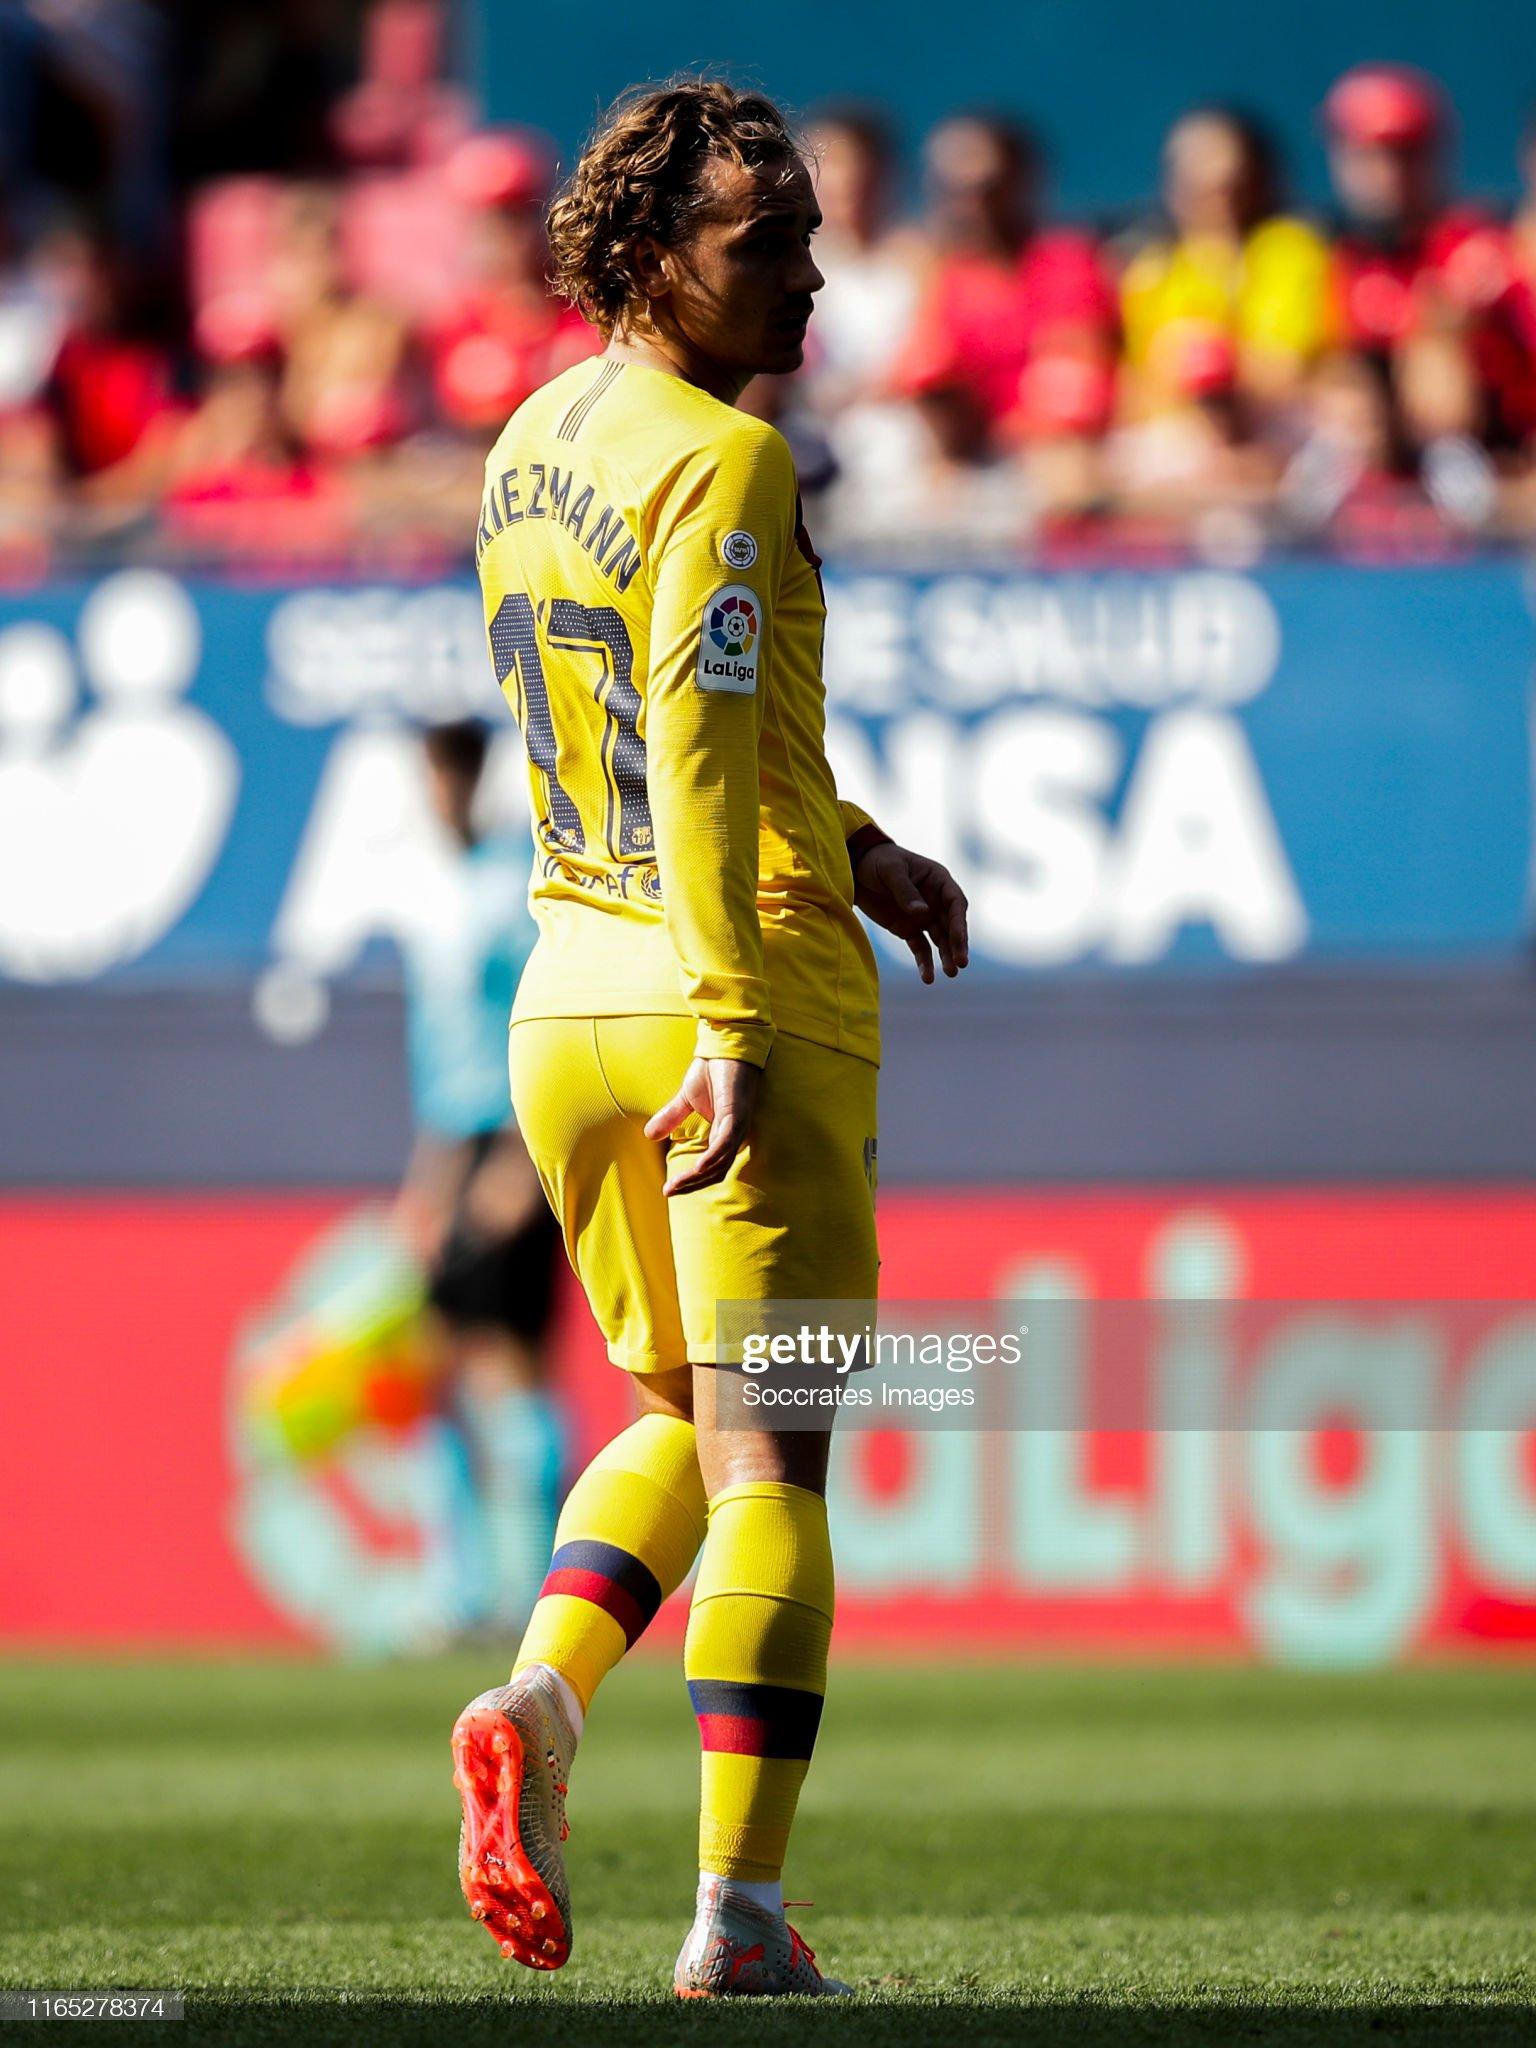 صور مباراة : أوساسونا - برشلونة 2-2 ( 31-08-2019 )  Antoine-griezmann-of-fc-barcelona-during-the-la-liga-santander-match-picture-id1165278374?s=2048x2048